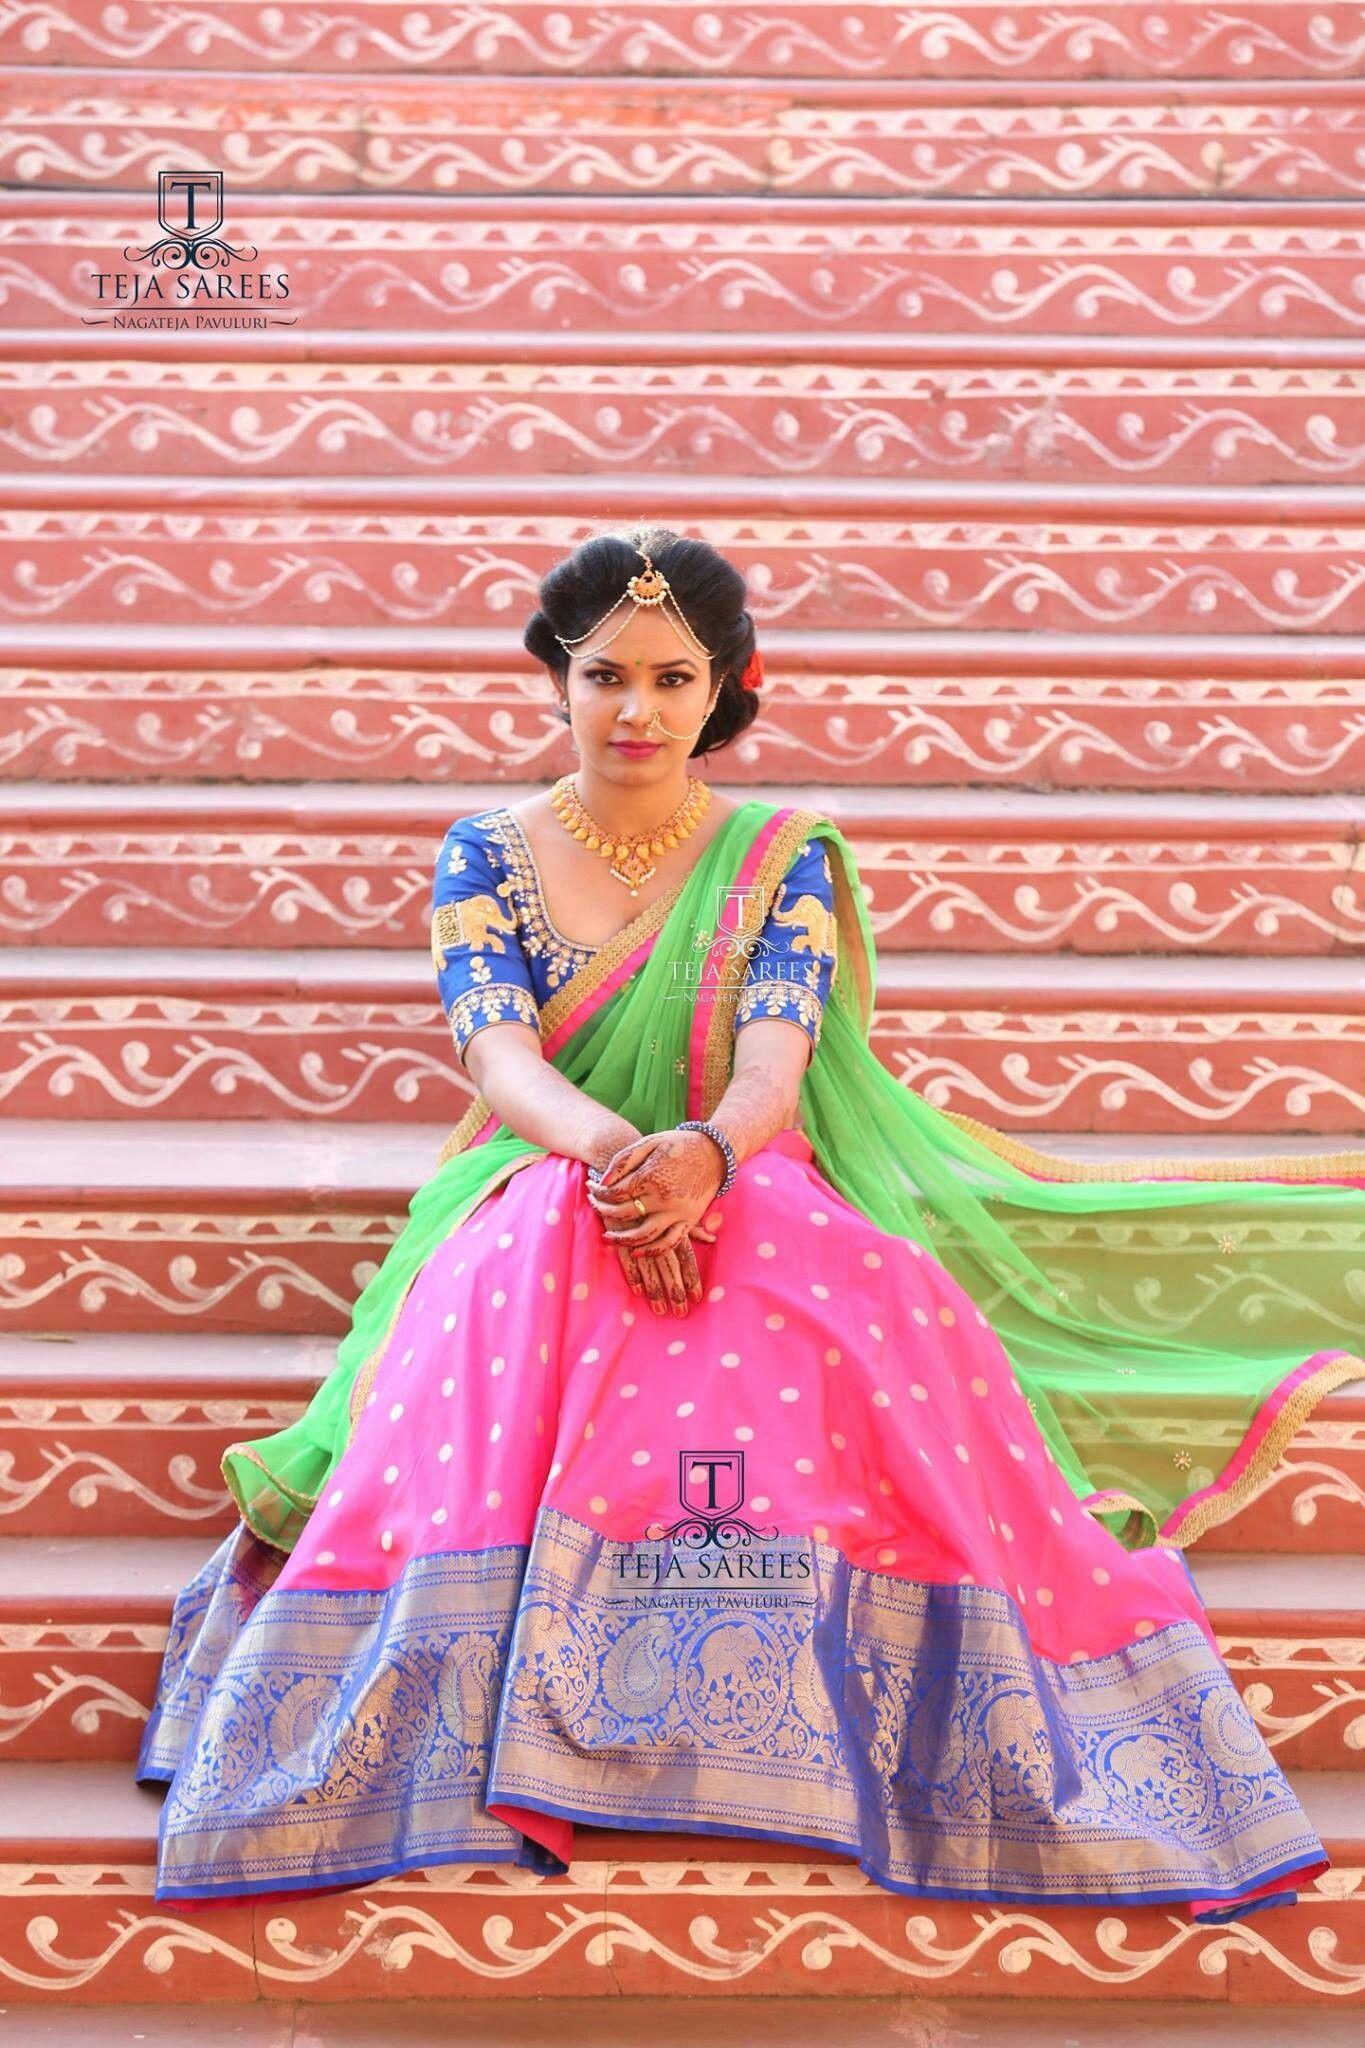 Pin de Rashika Ramachandran en Mehendi look | Pinterest